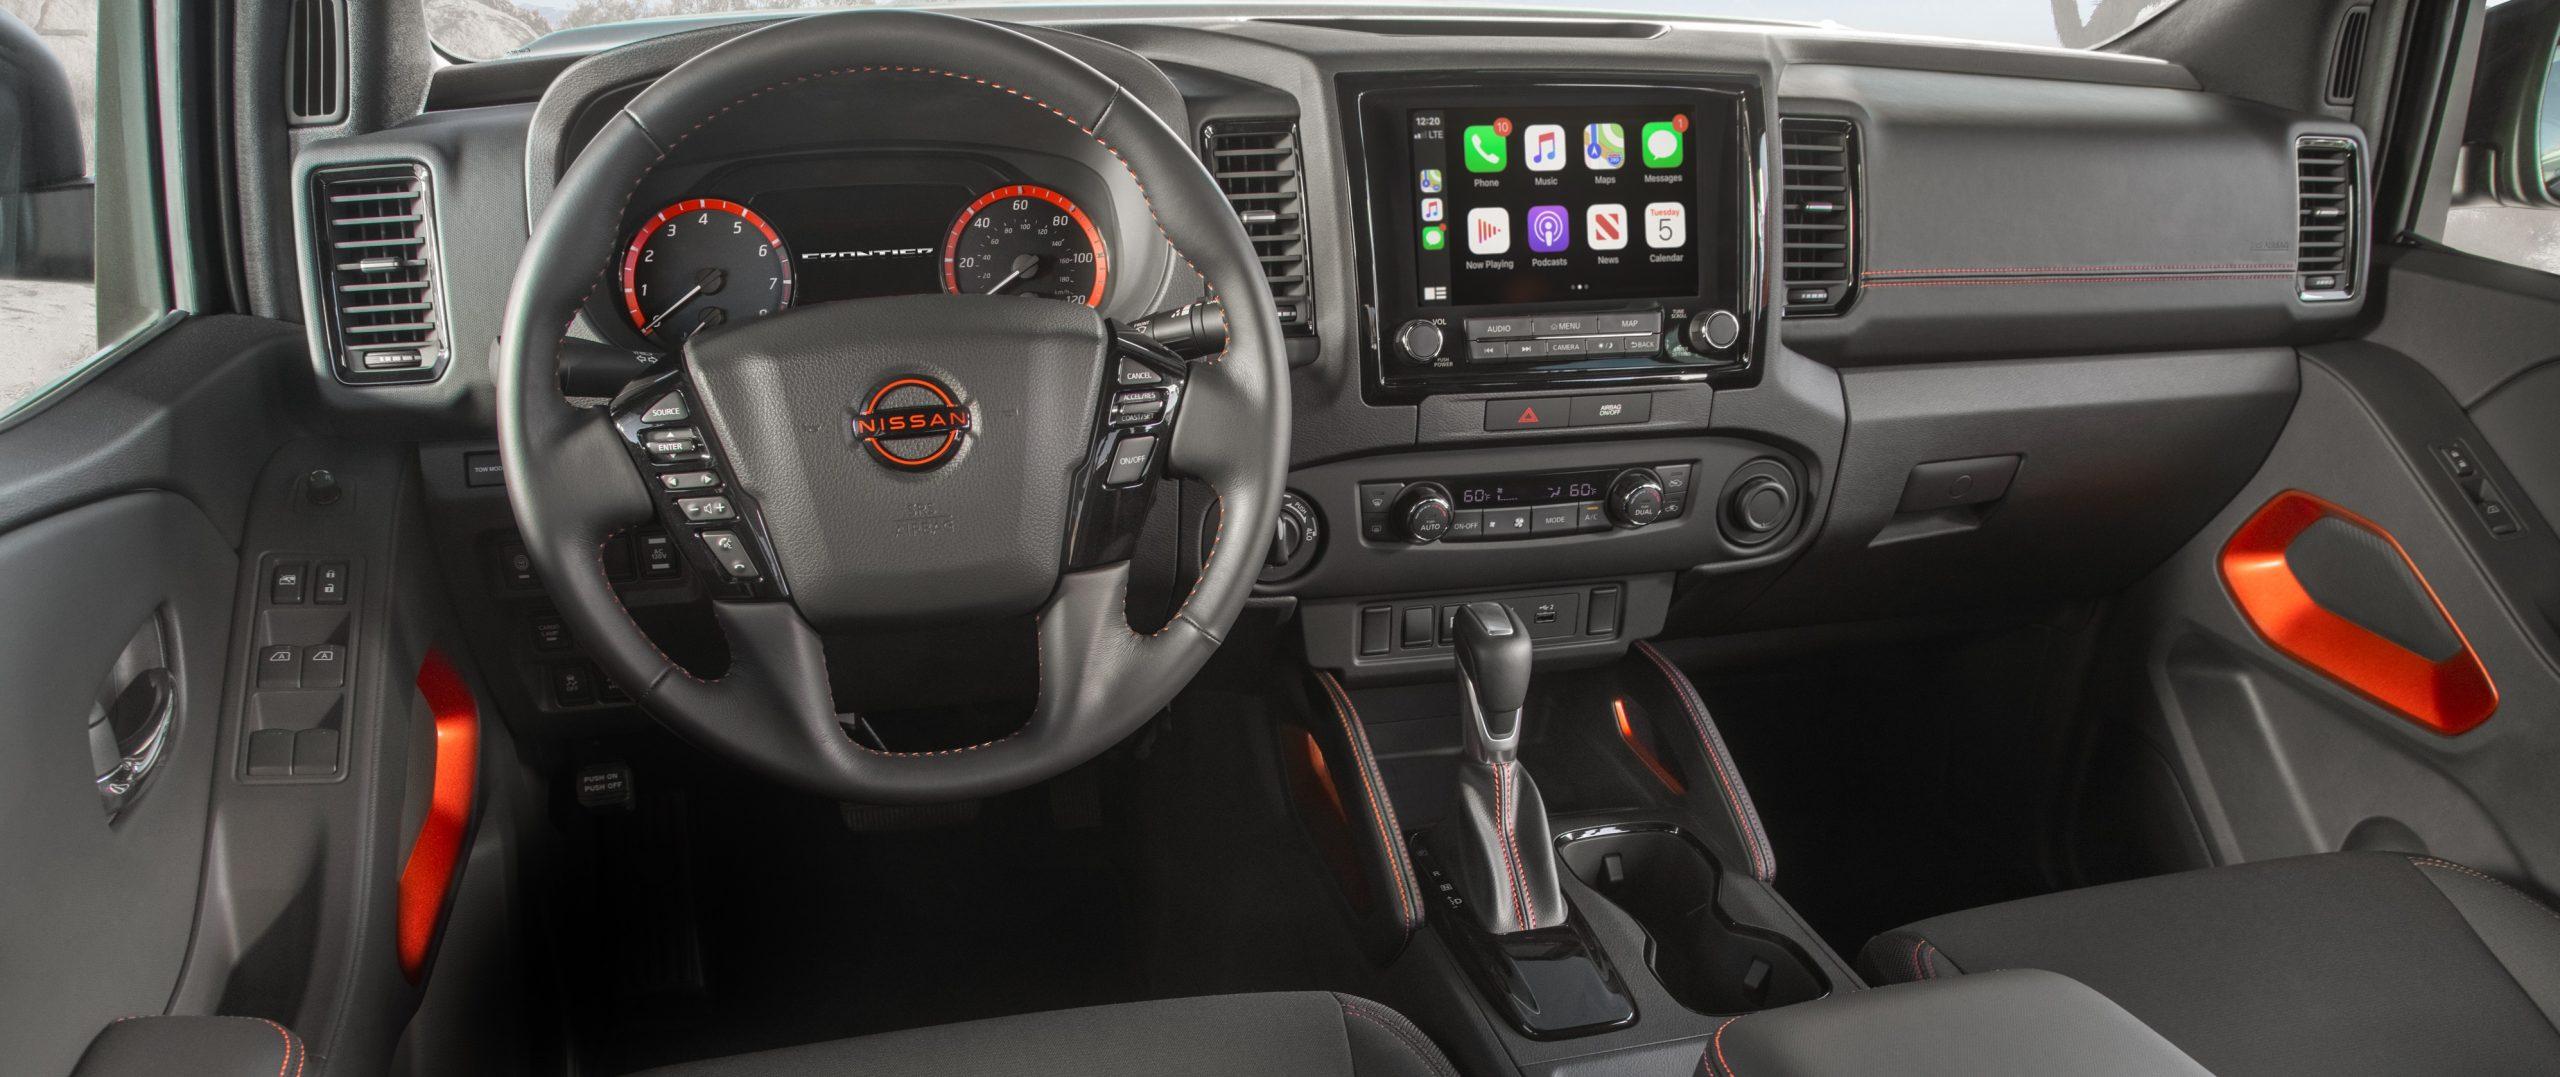 Nissan Frontier Brownsville